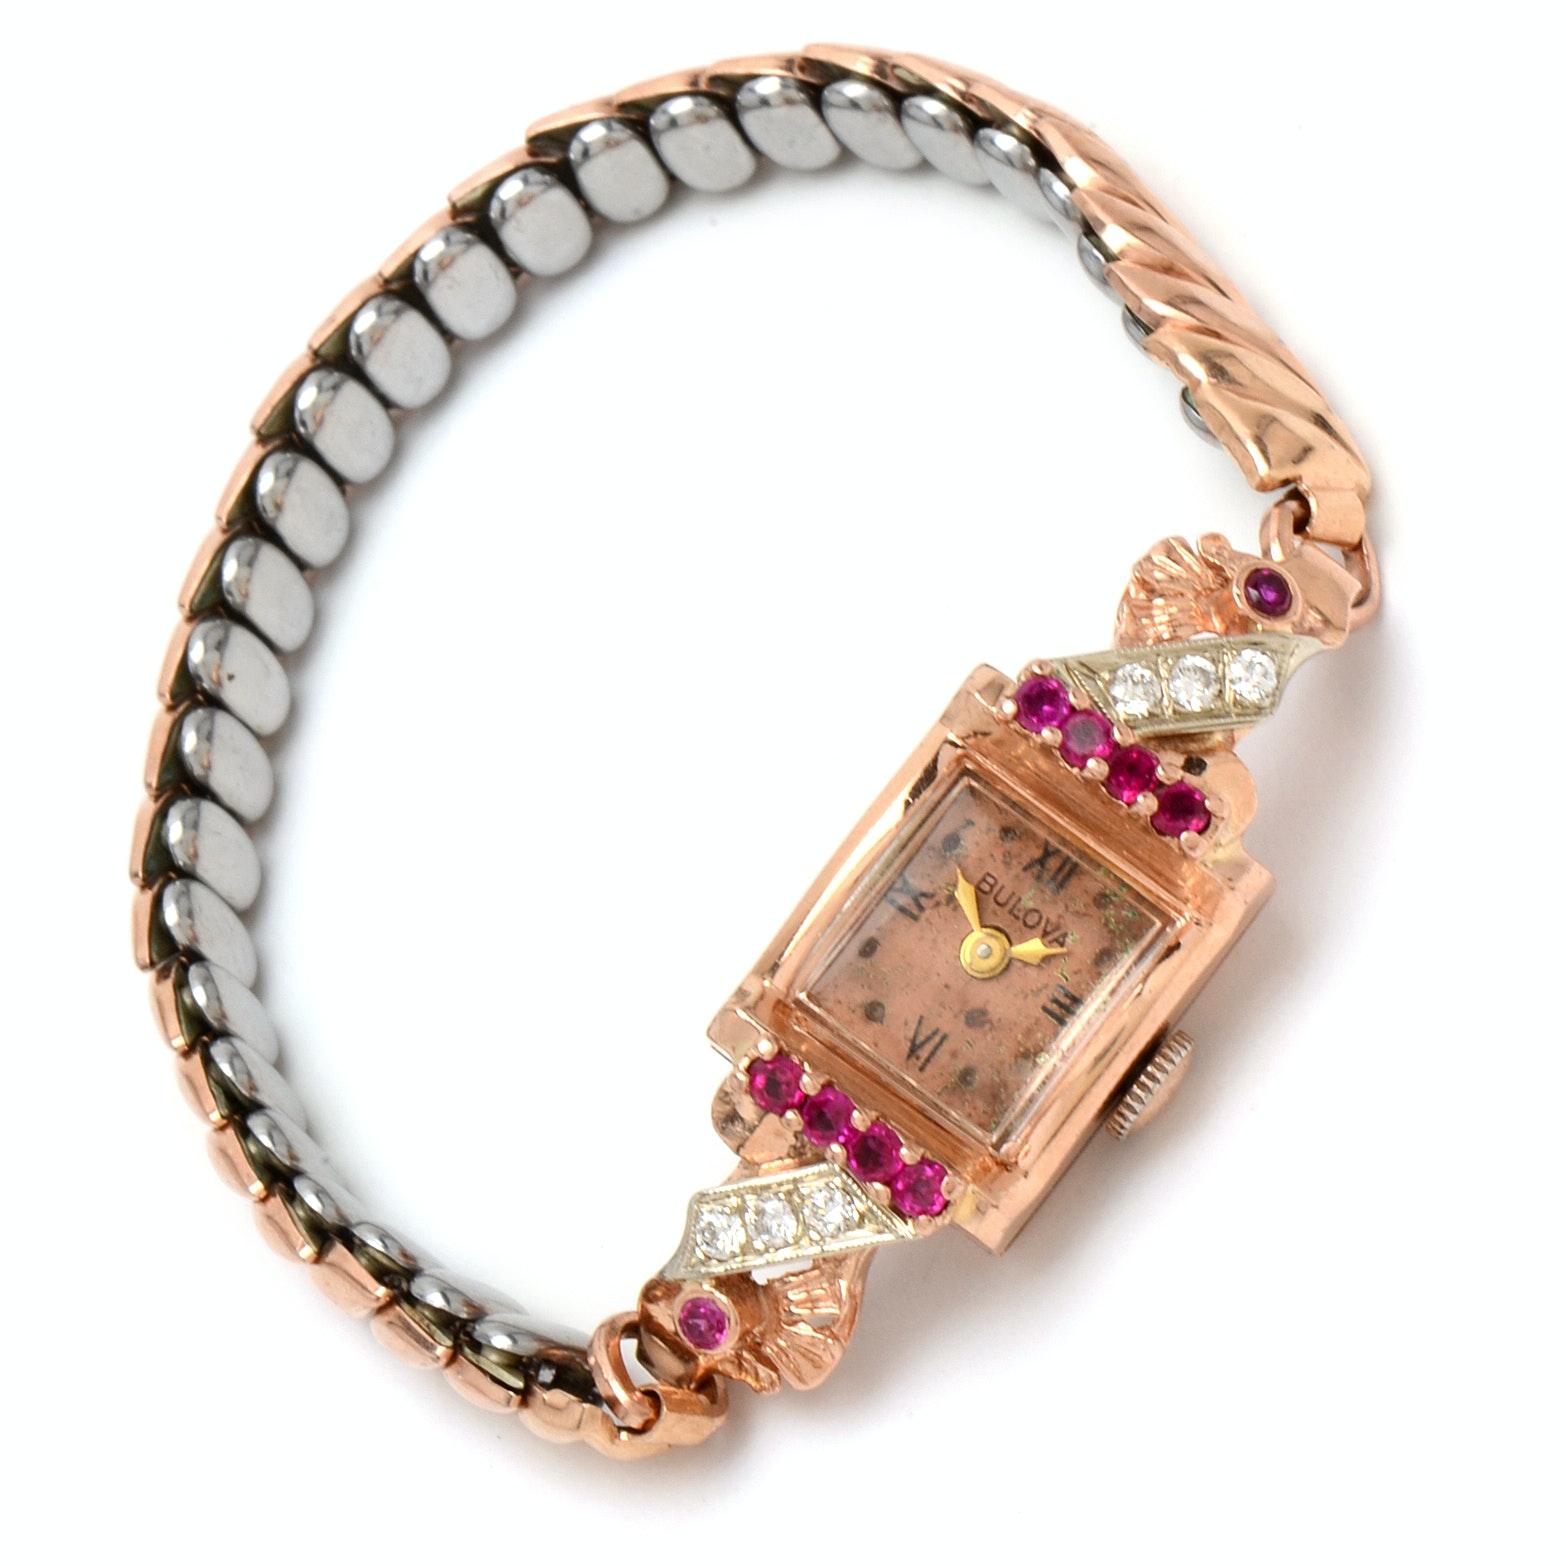 Vintage 14K Bulova Rose Toned Diamond and Synthetic Ruby Wristwatch